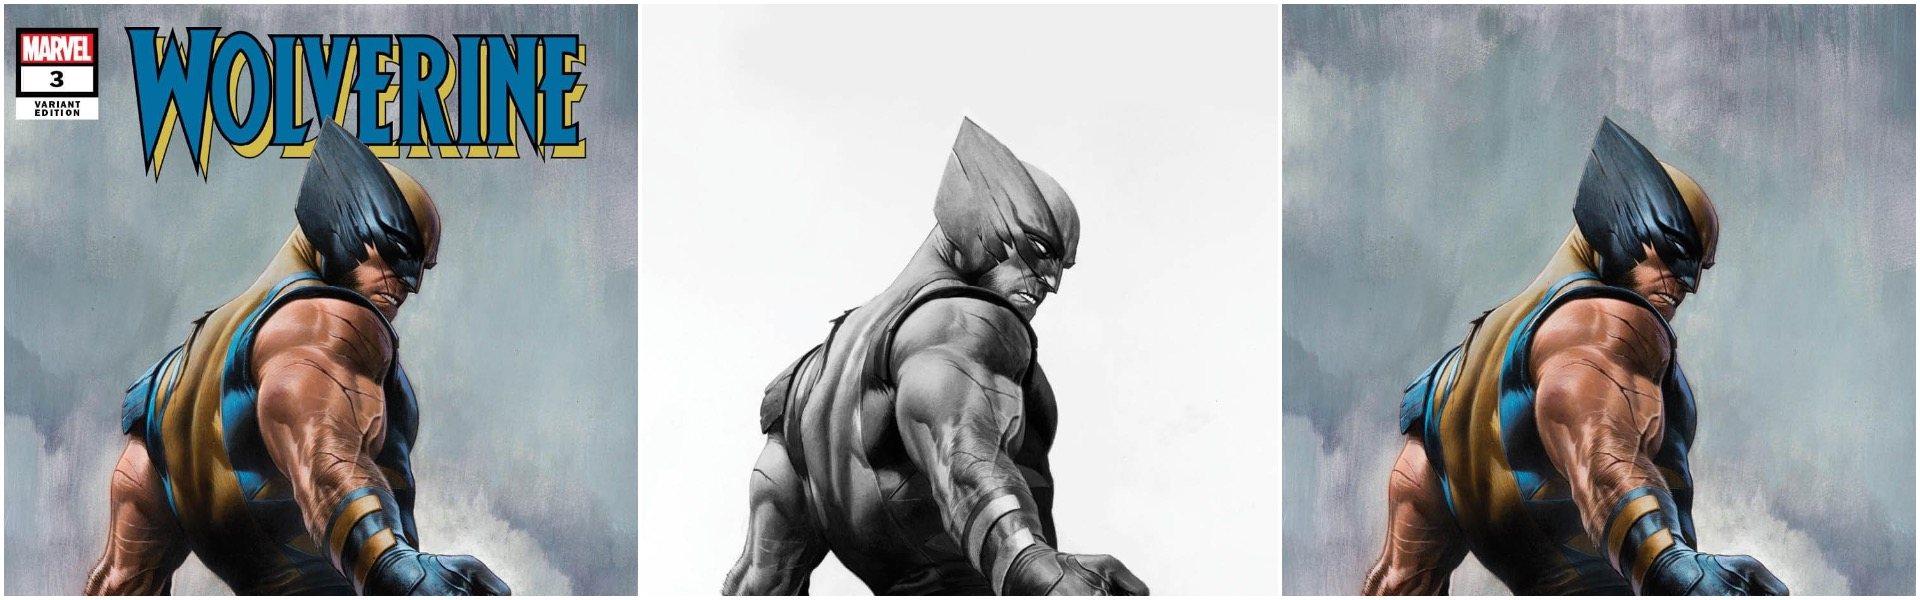 Wolverine #3 Adi Granov Variants